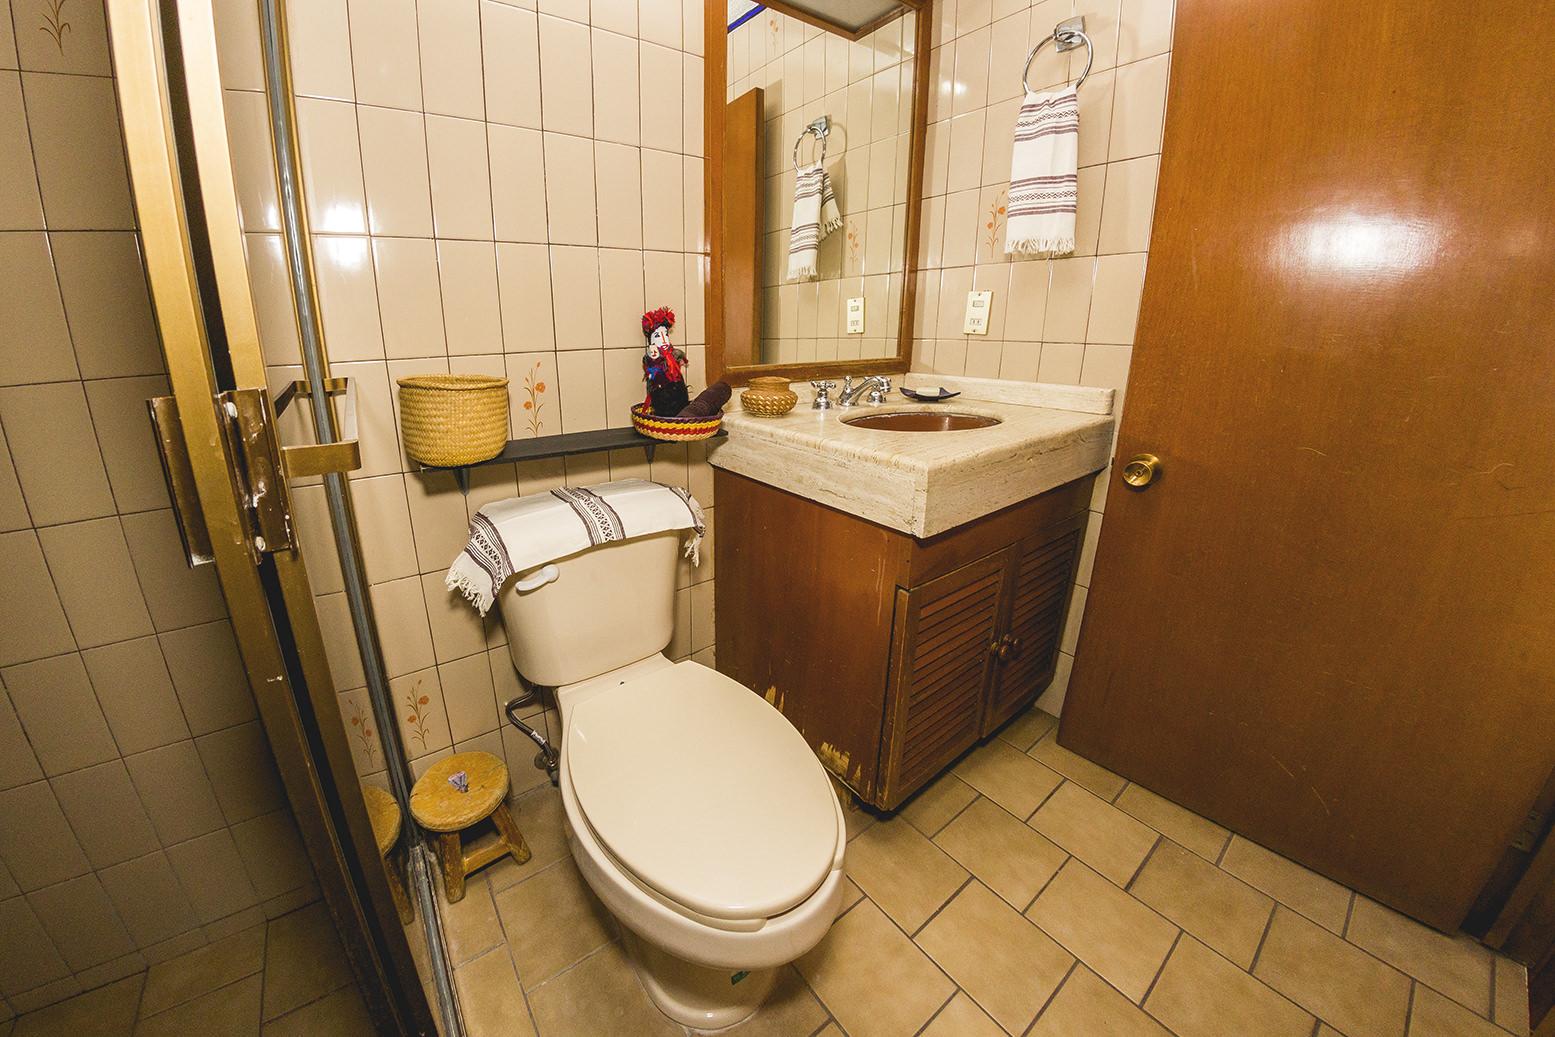 Big Room + Private Bathroom + Big House